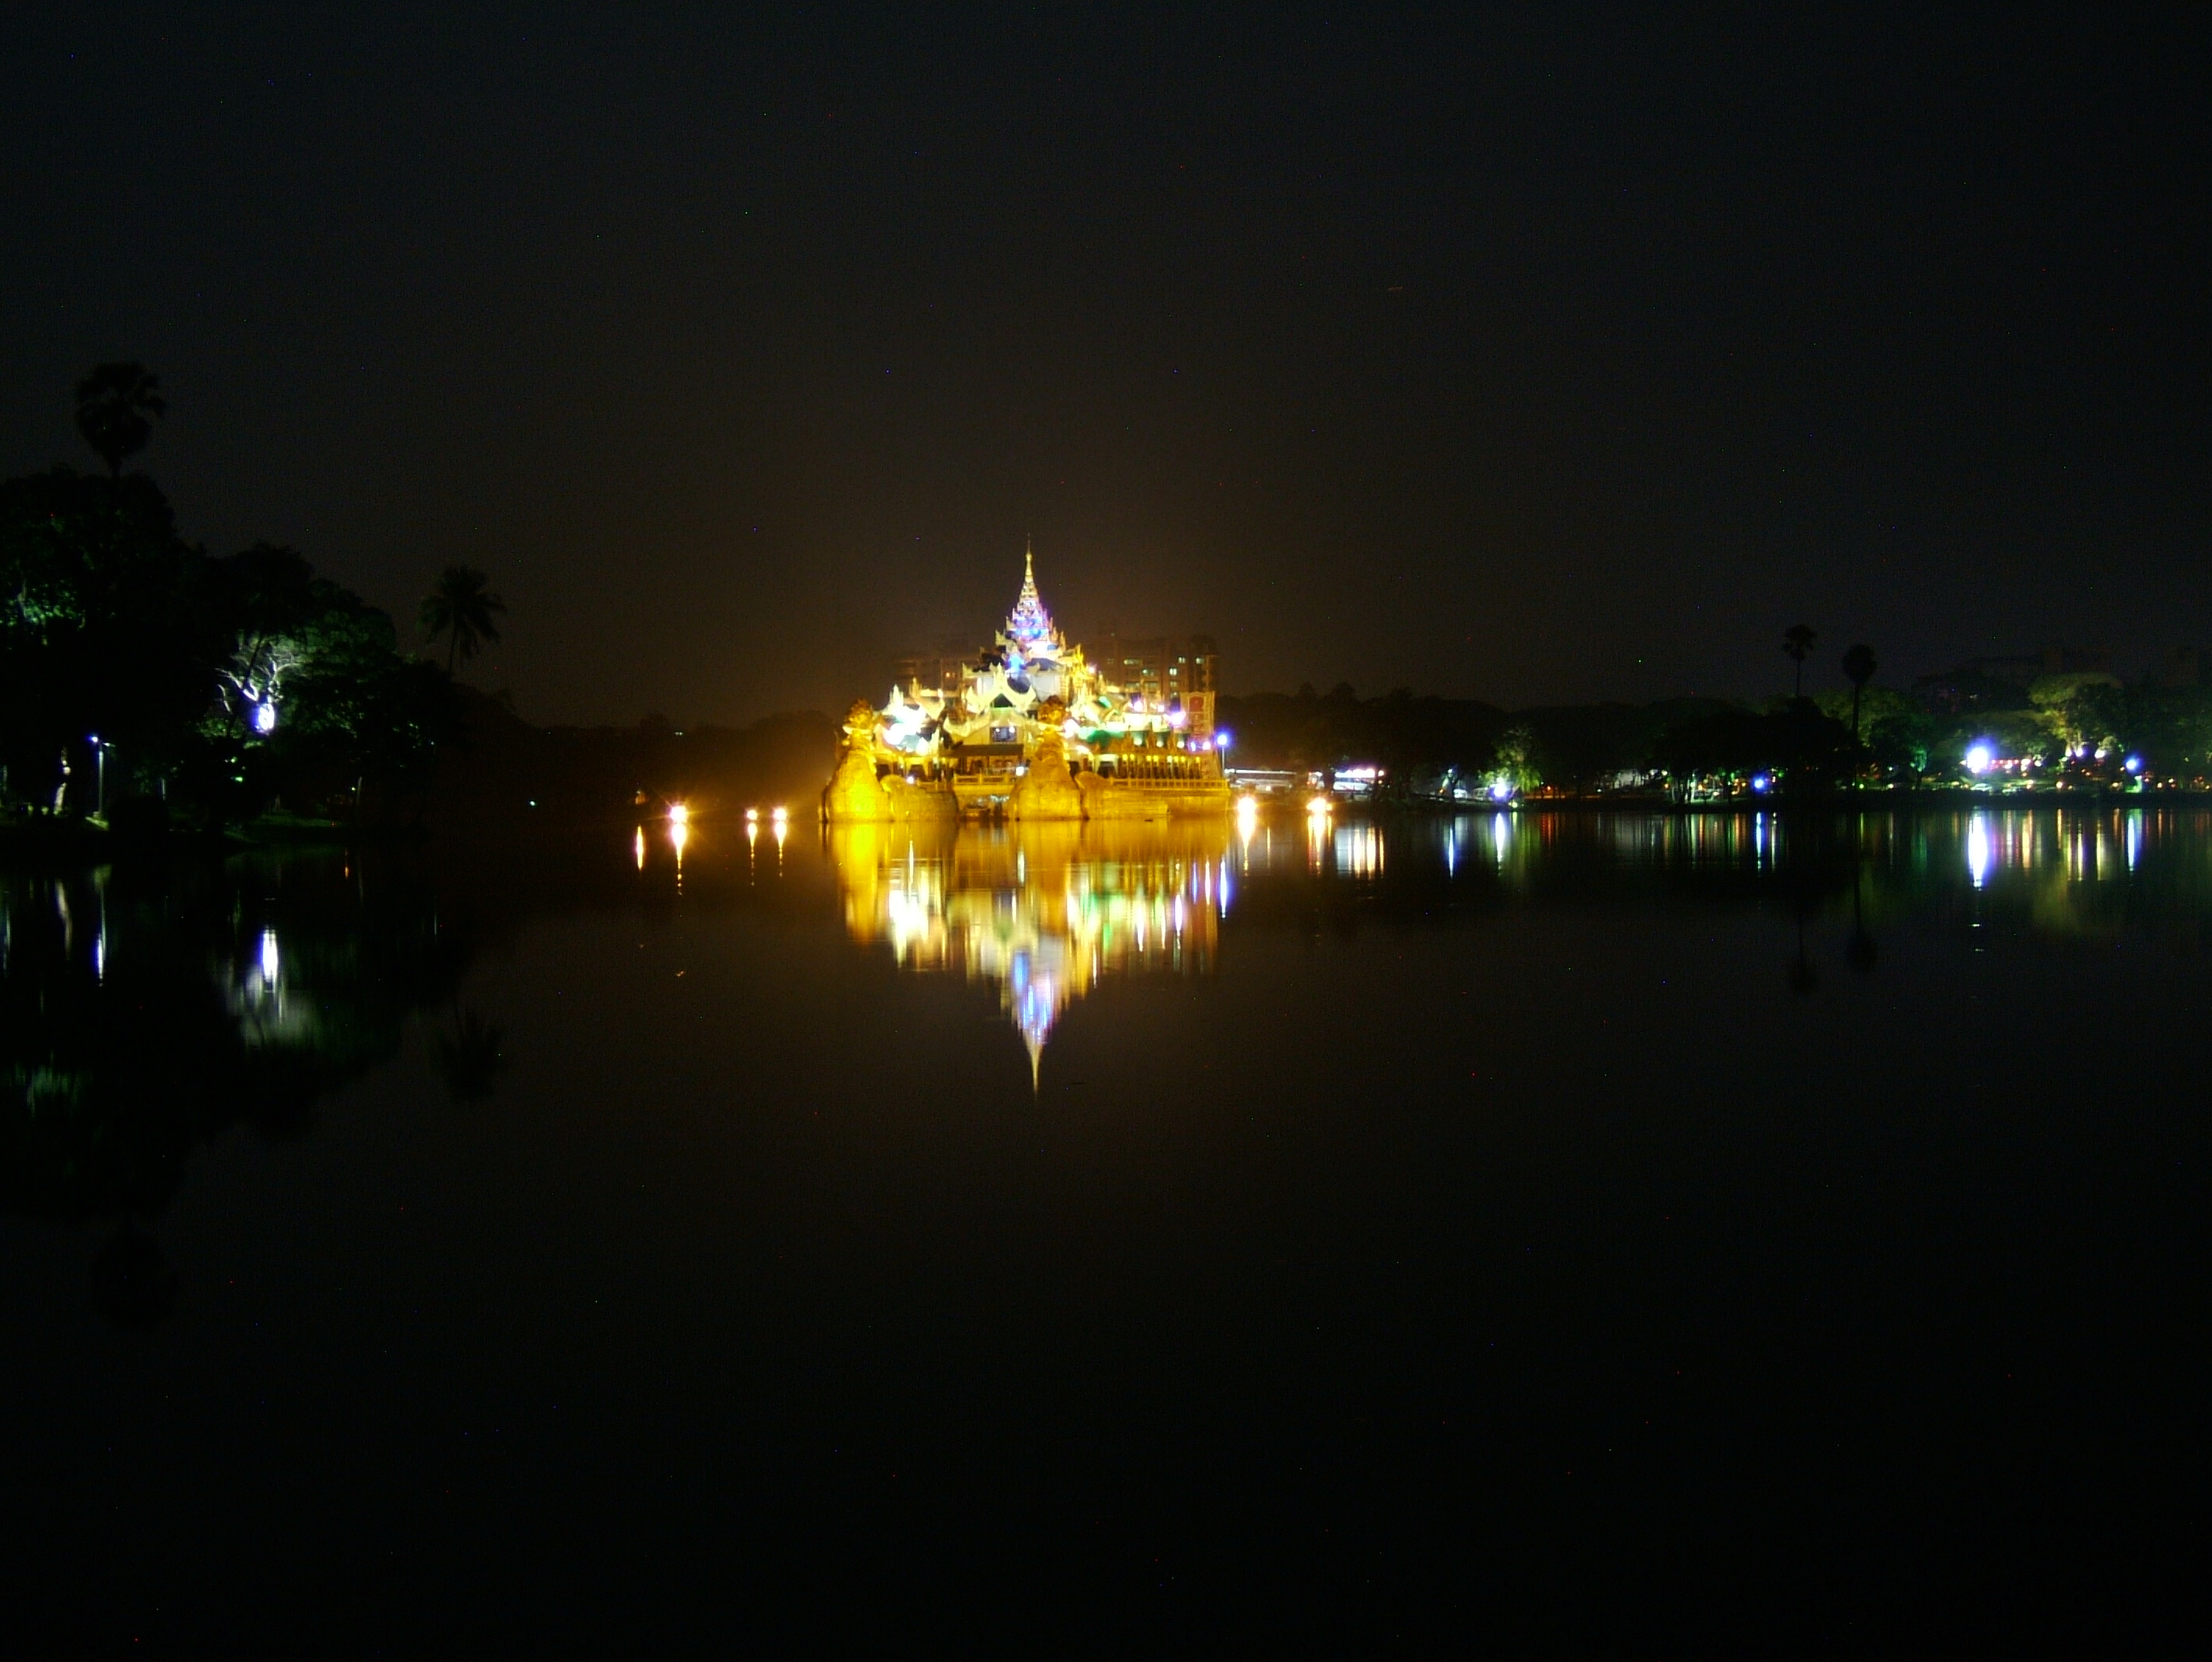 Myanmar Yangon Kandawgyi Palace Hotel royal barge Nov 2004 02